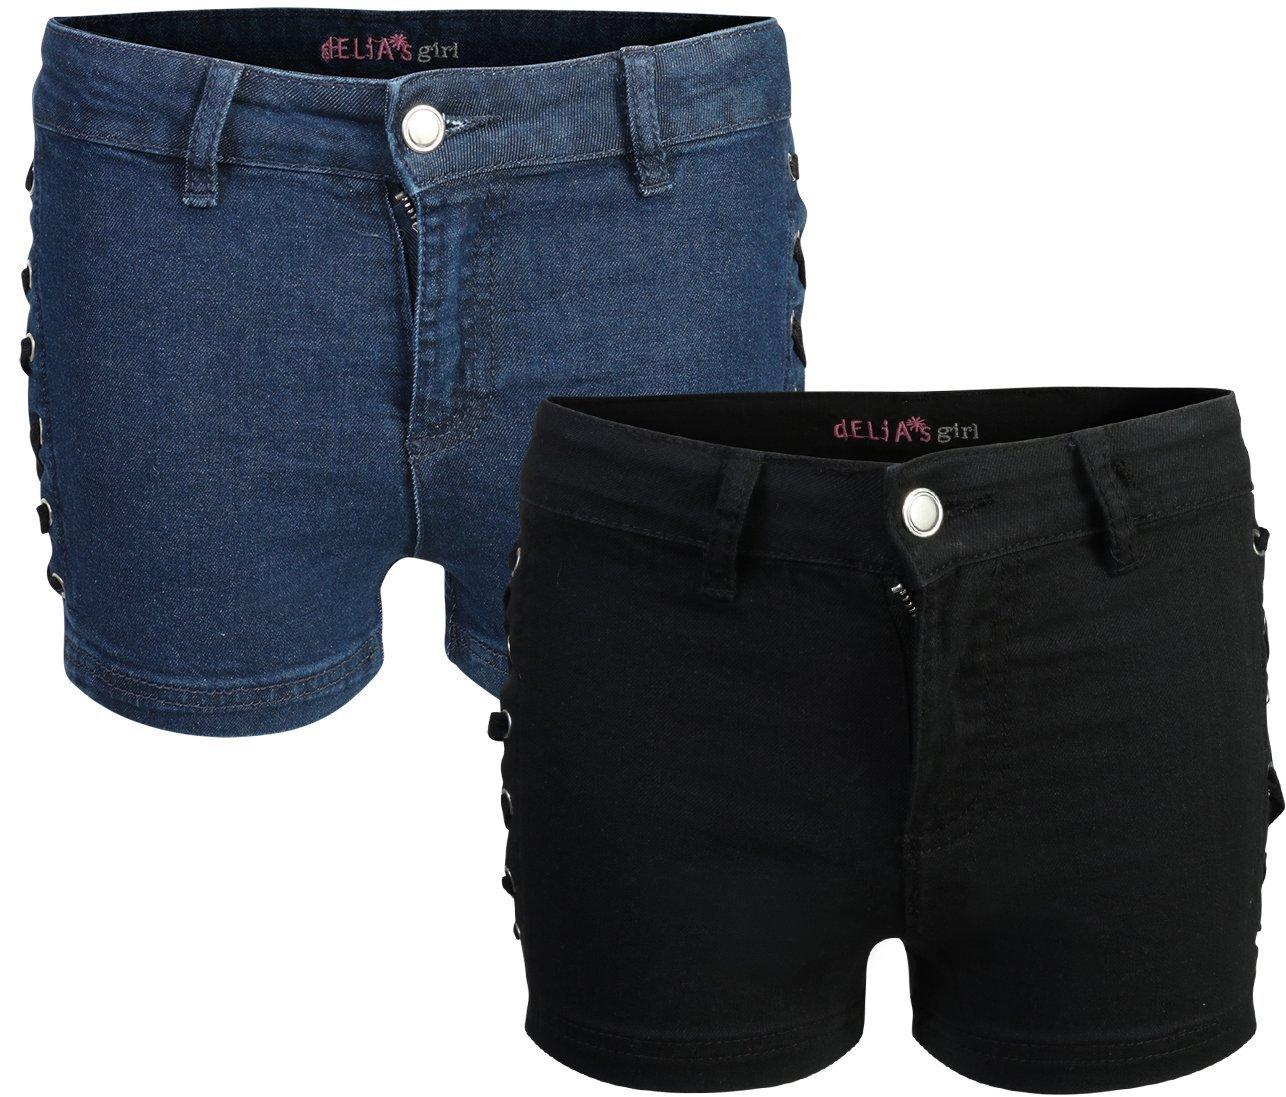 dELiA*s Girl's Denim Twill Shorts (2 Pack), Black & Blue, Size 12'